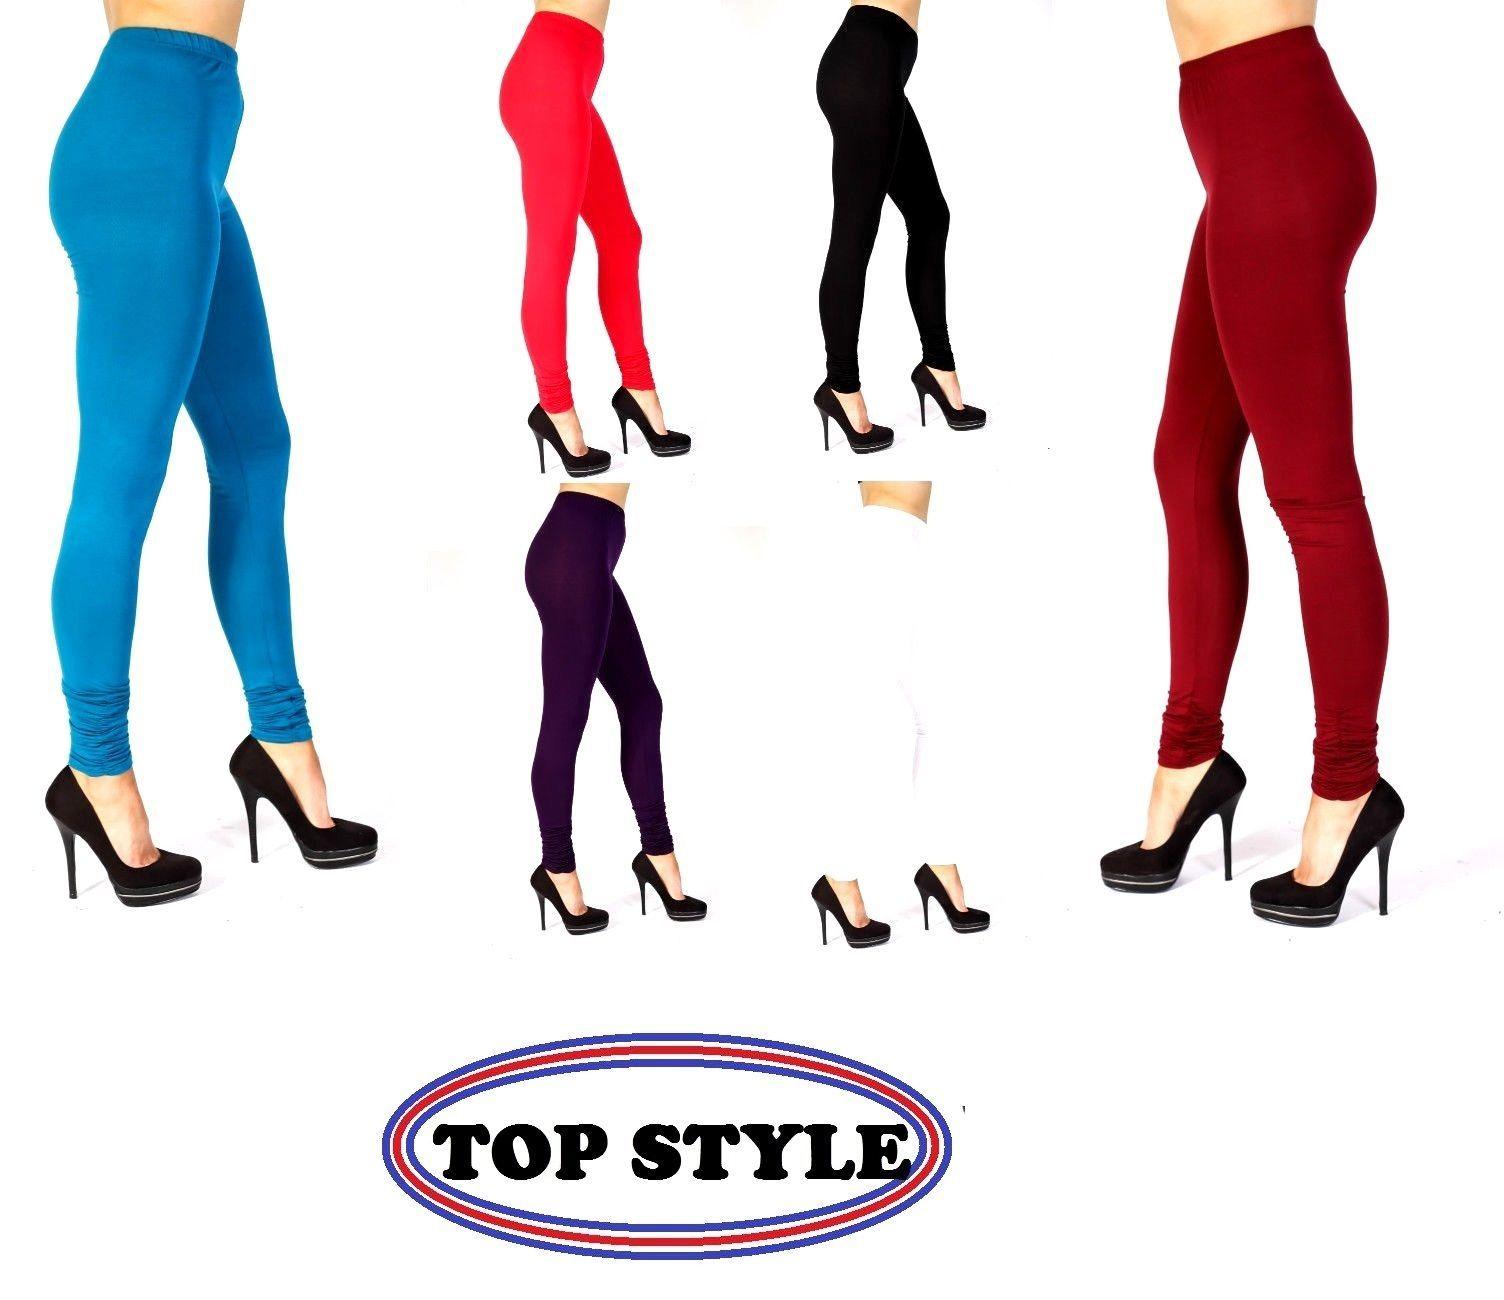 190227fc032e3 Womens Ladies Plain Stretchy Viscose Full Length Leggings Plus Size 8-26  Cntl